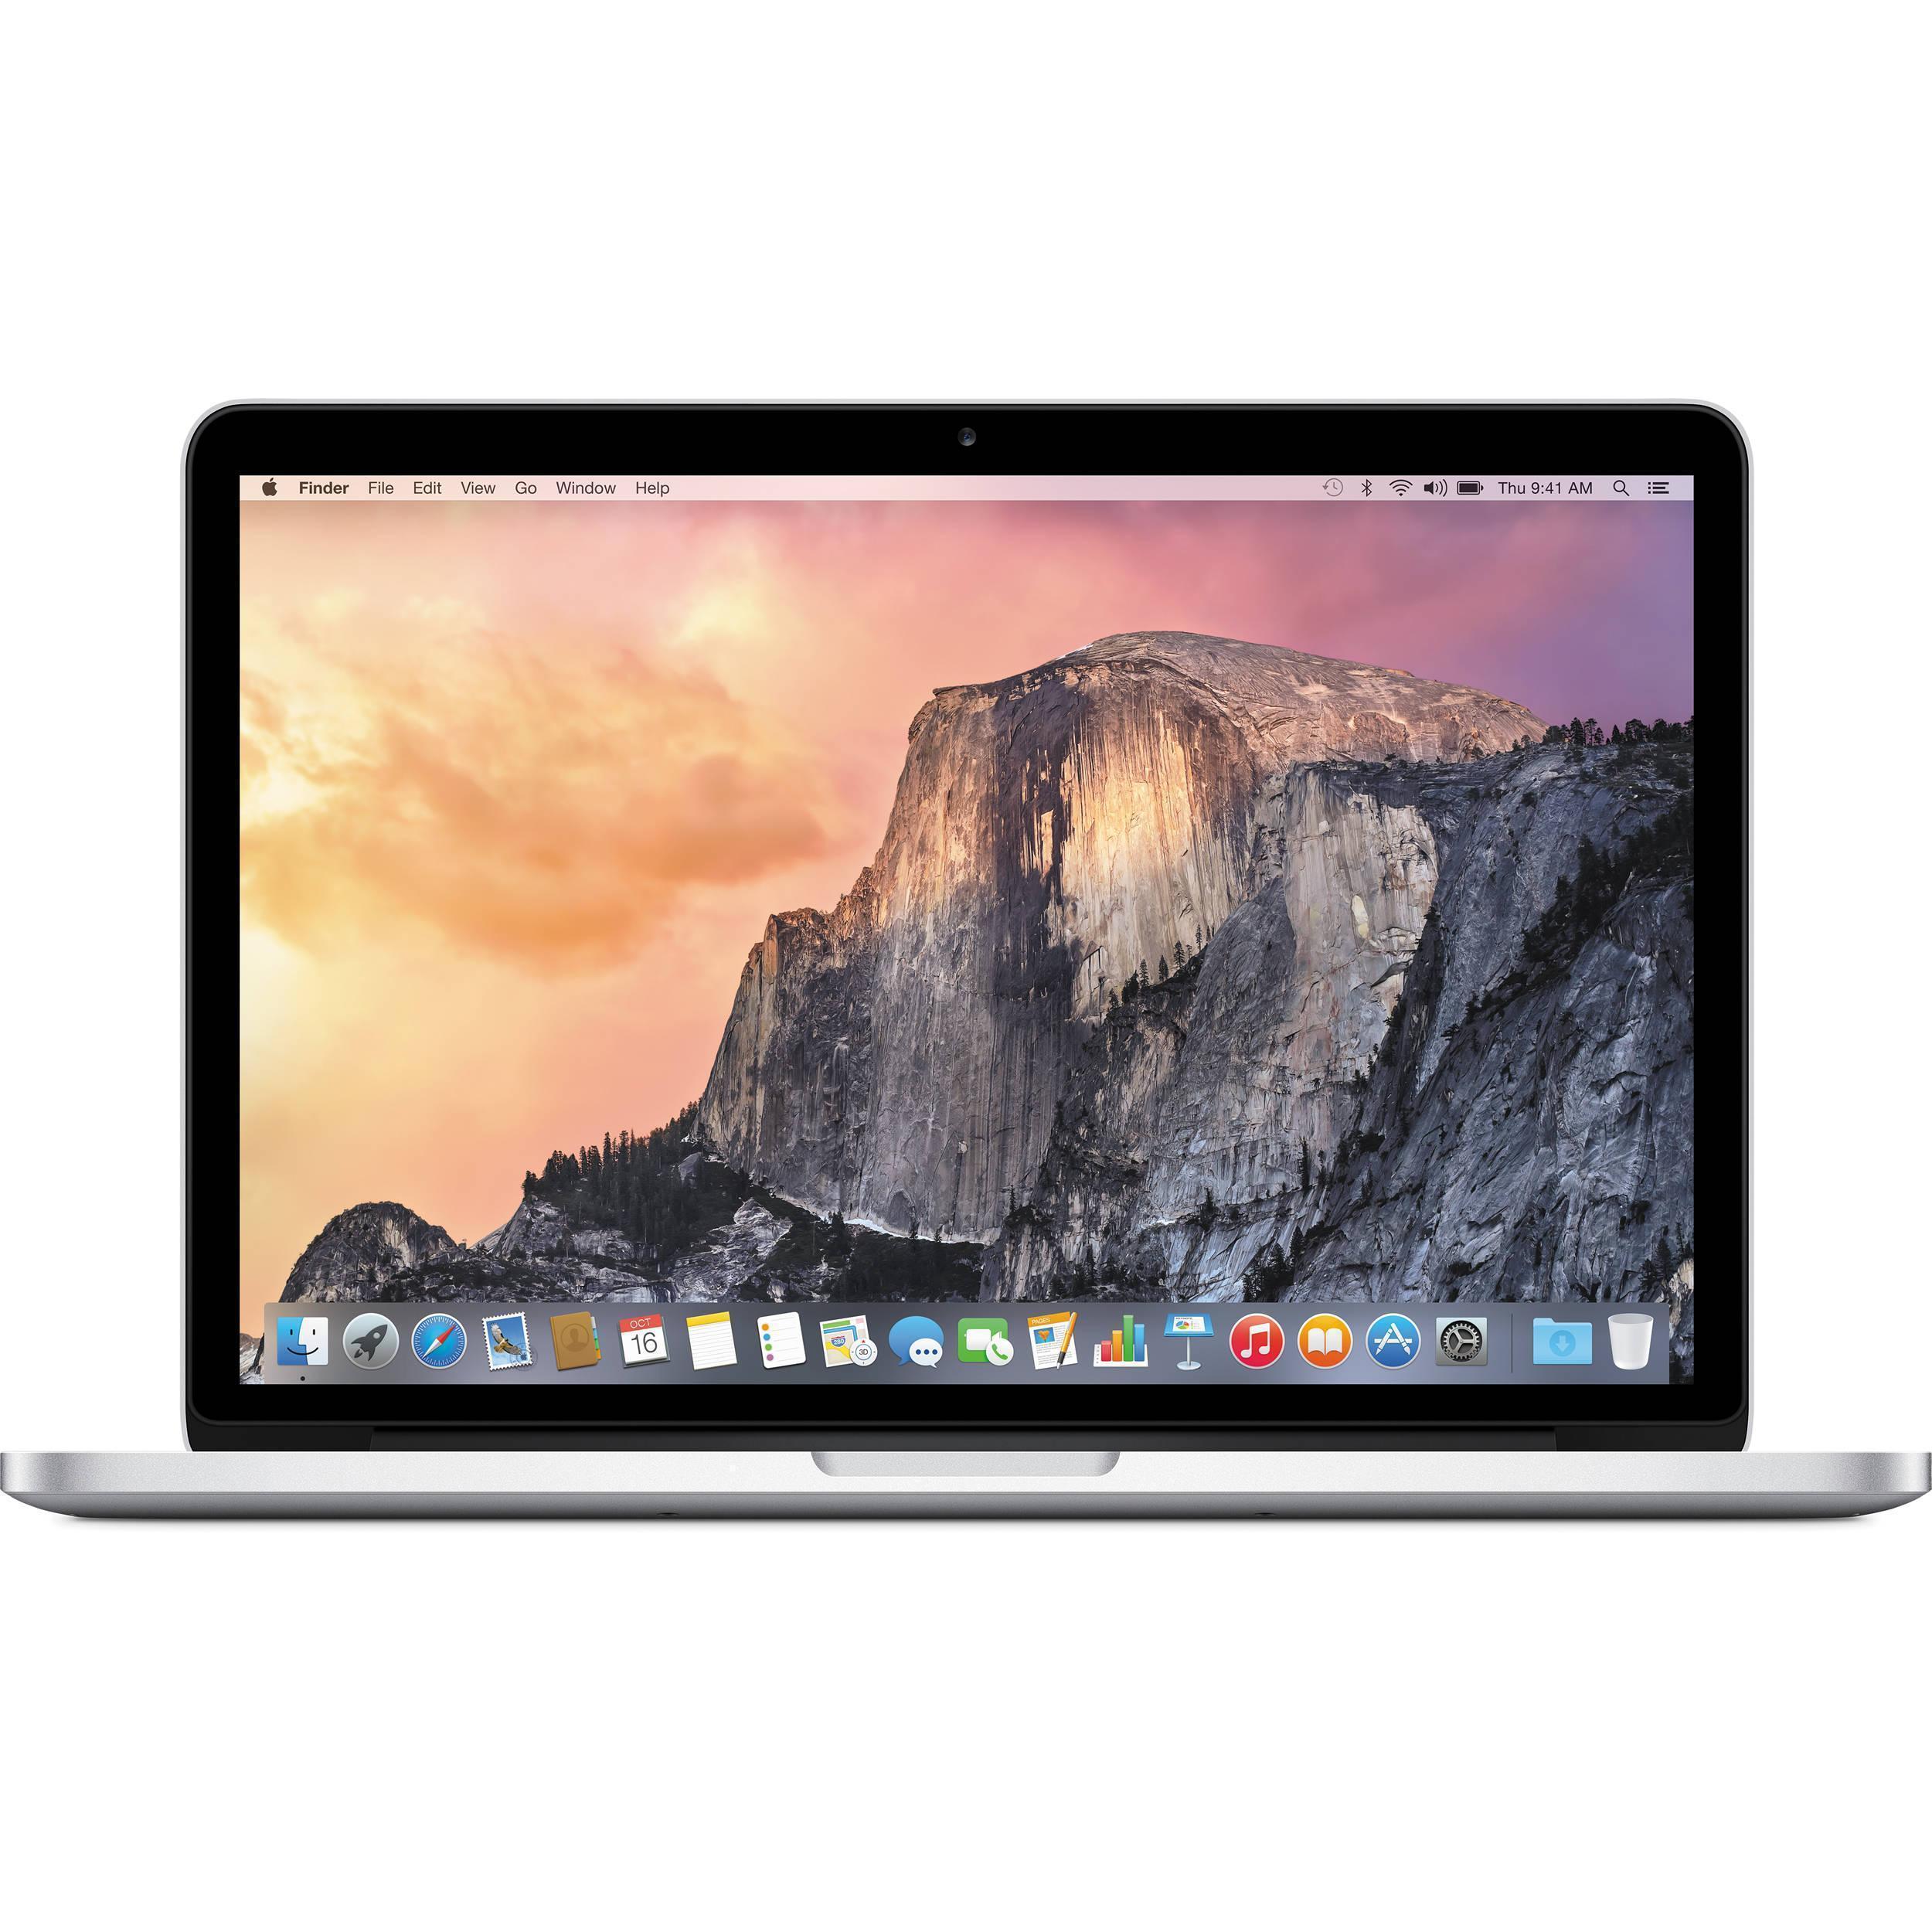 MacBook Pro Retina 13.3-inch (2014) - Core i5 - 8GB - SSD 256 GB QWERTY